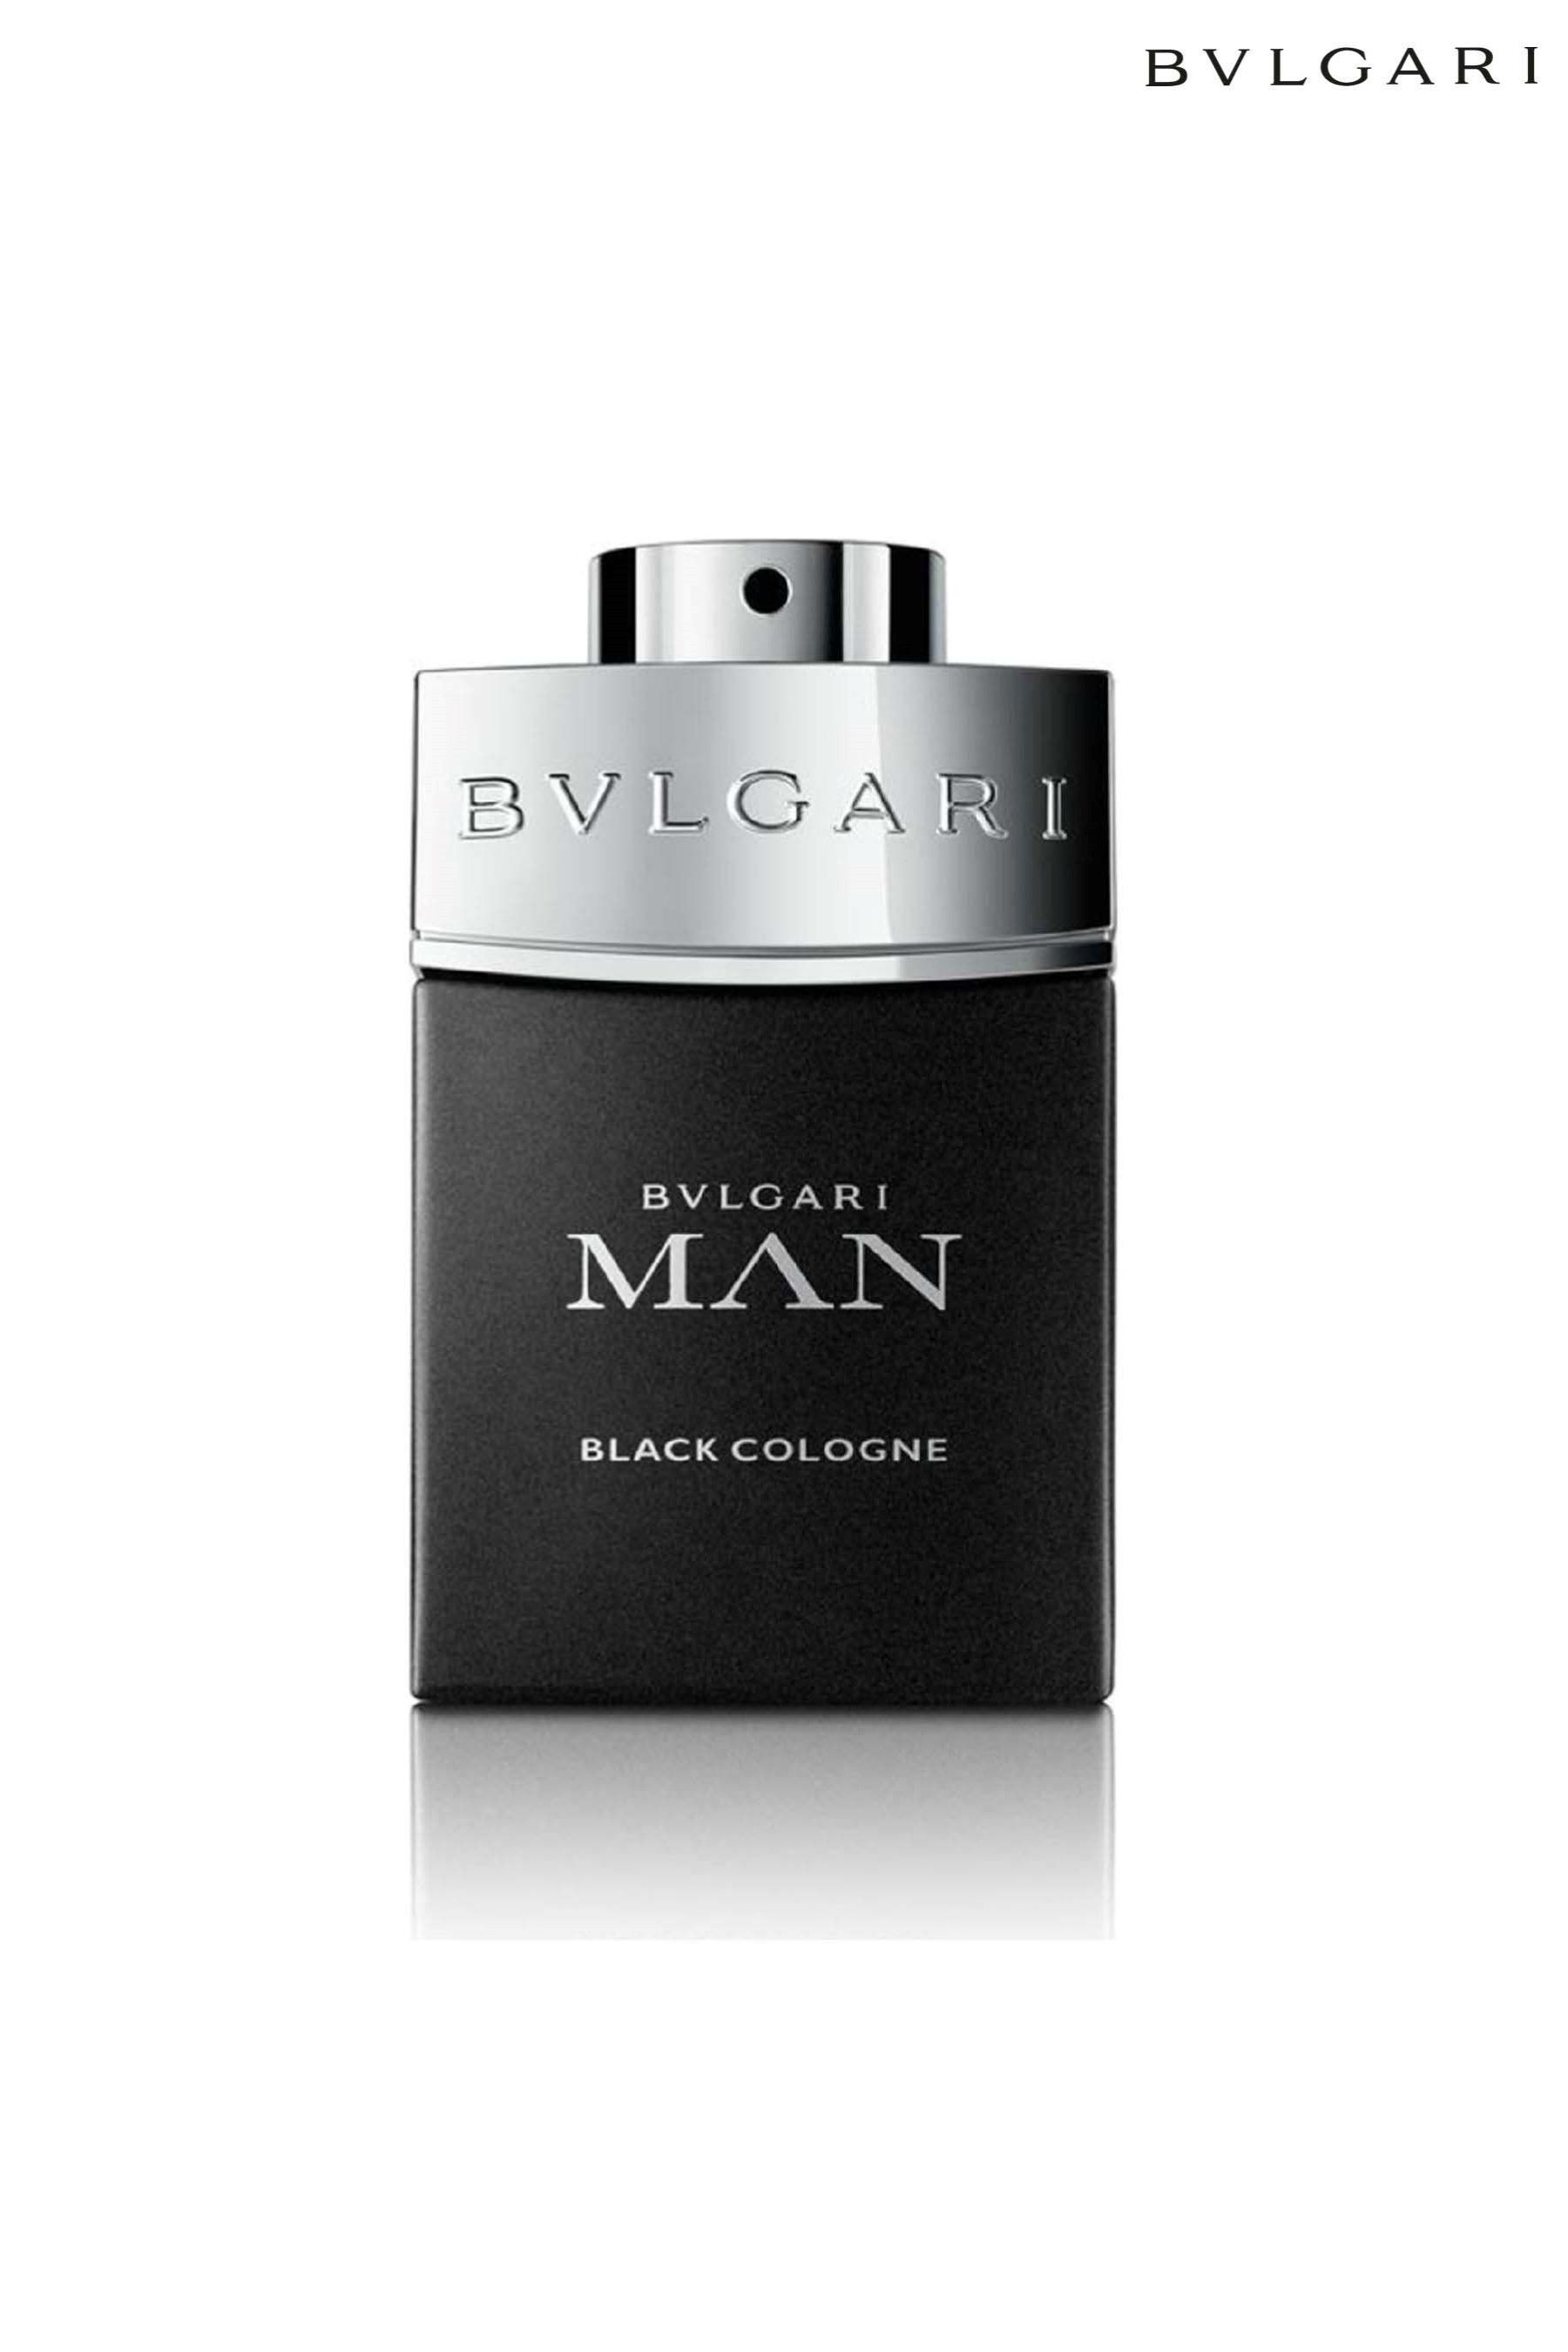 43a9cd1021 Mens Bvlgari Man Black Cologne Eau De Toilette Spray - Nude ...